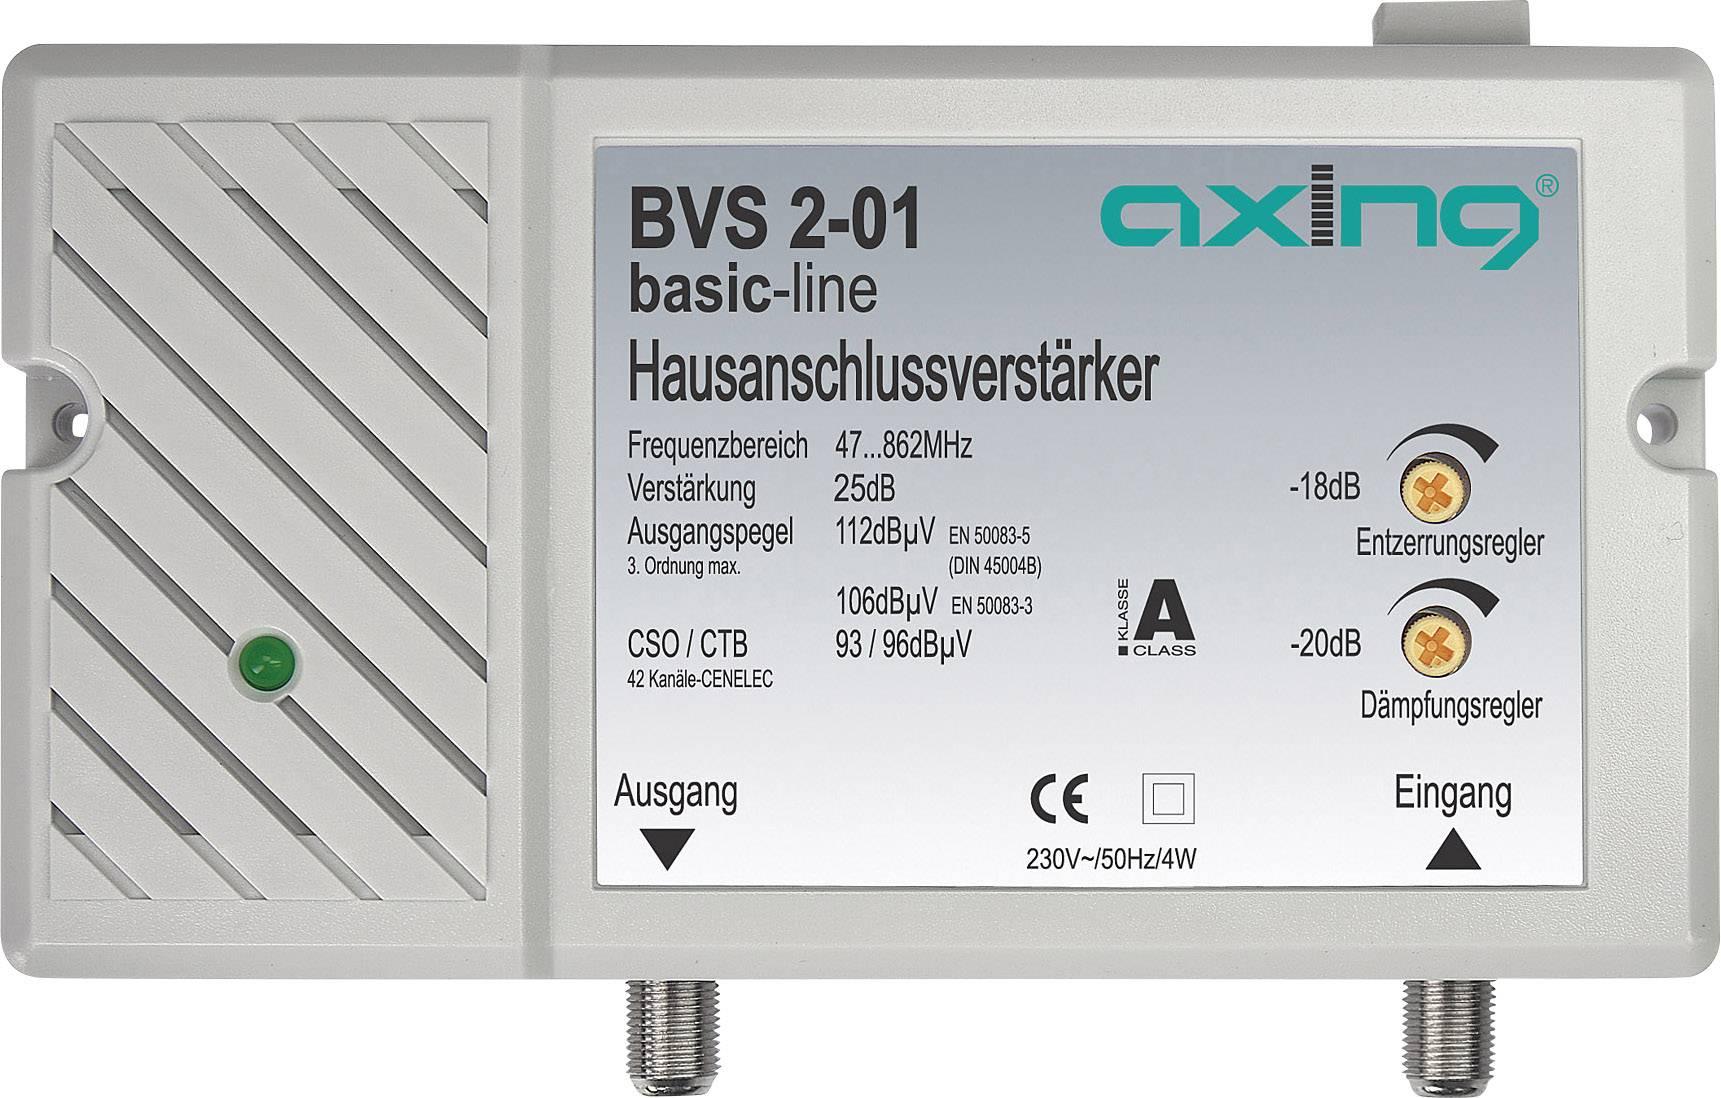 Anténní zesilovač Axing BVS 2-01, 25 dB